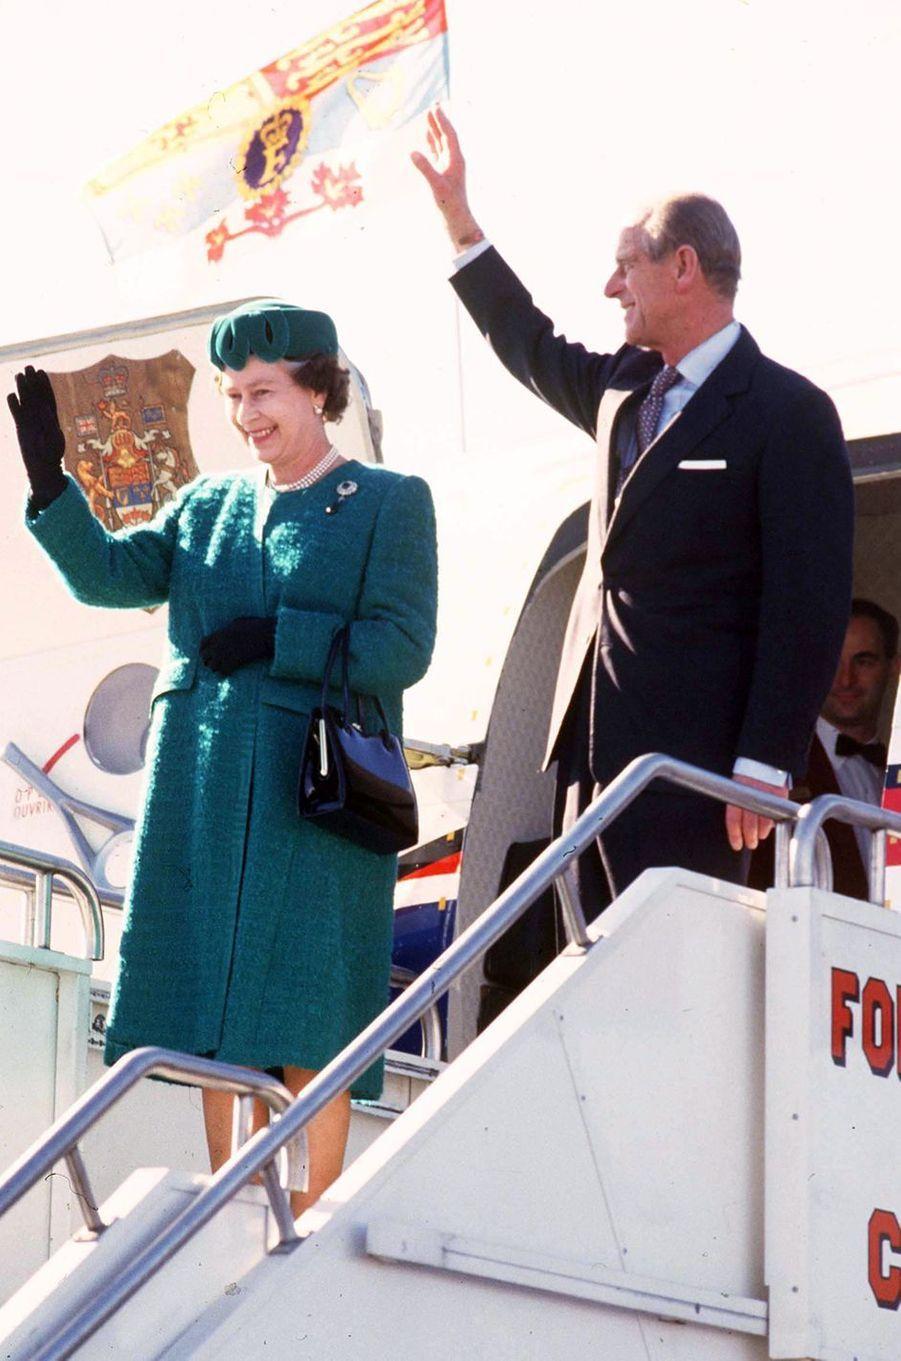 La reine Elizabeth II avec le prince Philip au Canada, le 24 octobre 1987